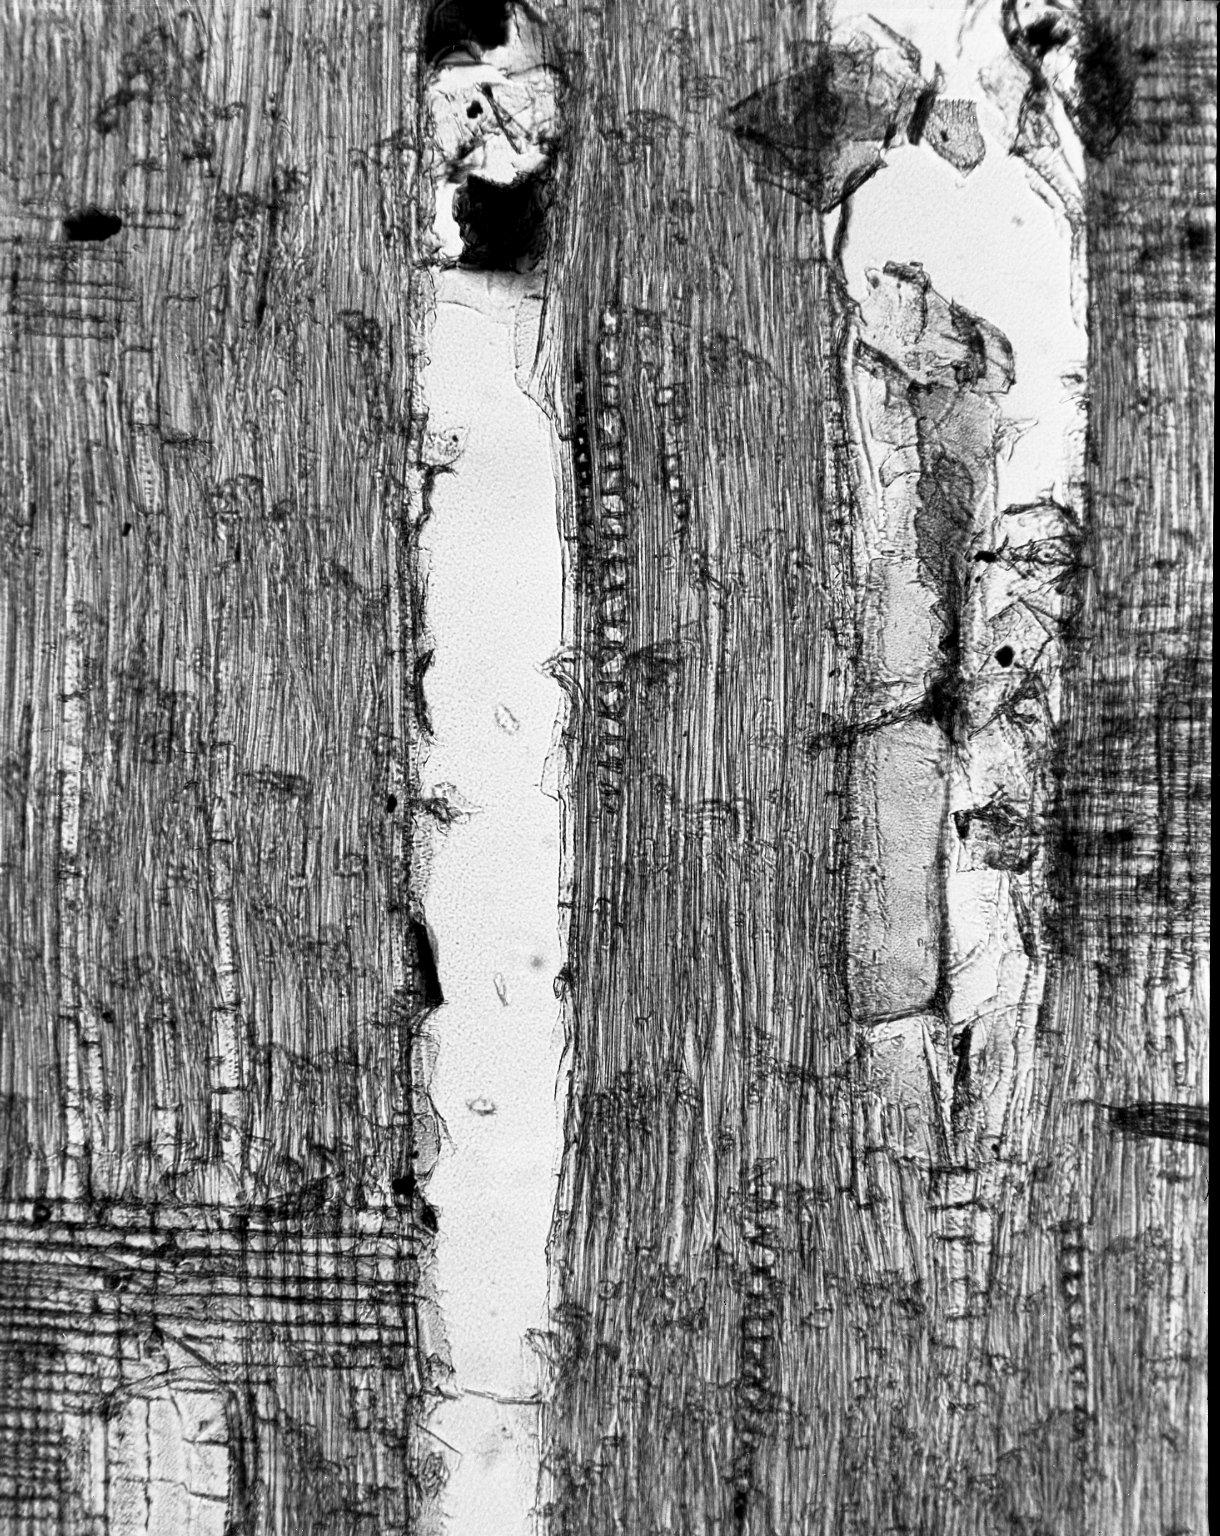 MELIACEAE Lovoa trichilioides